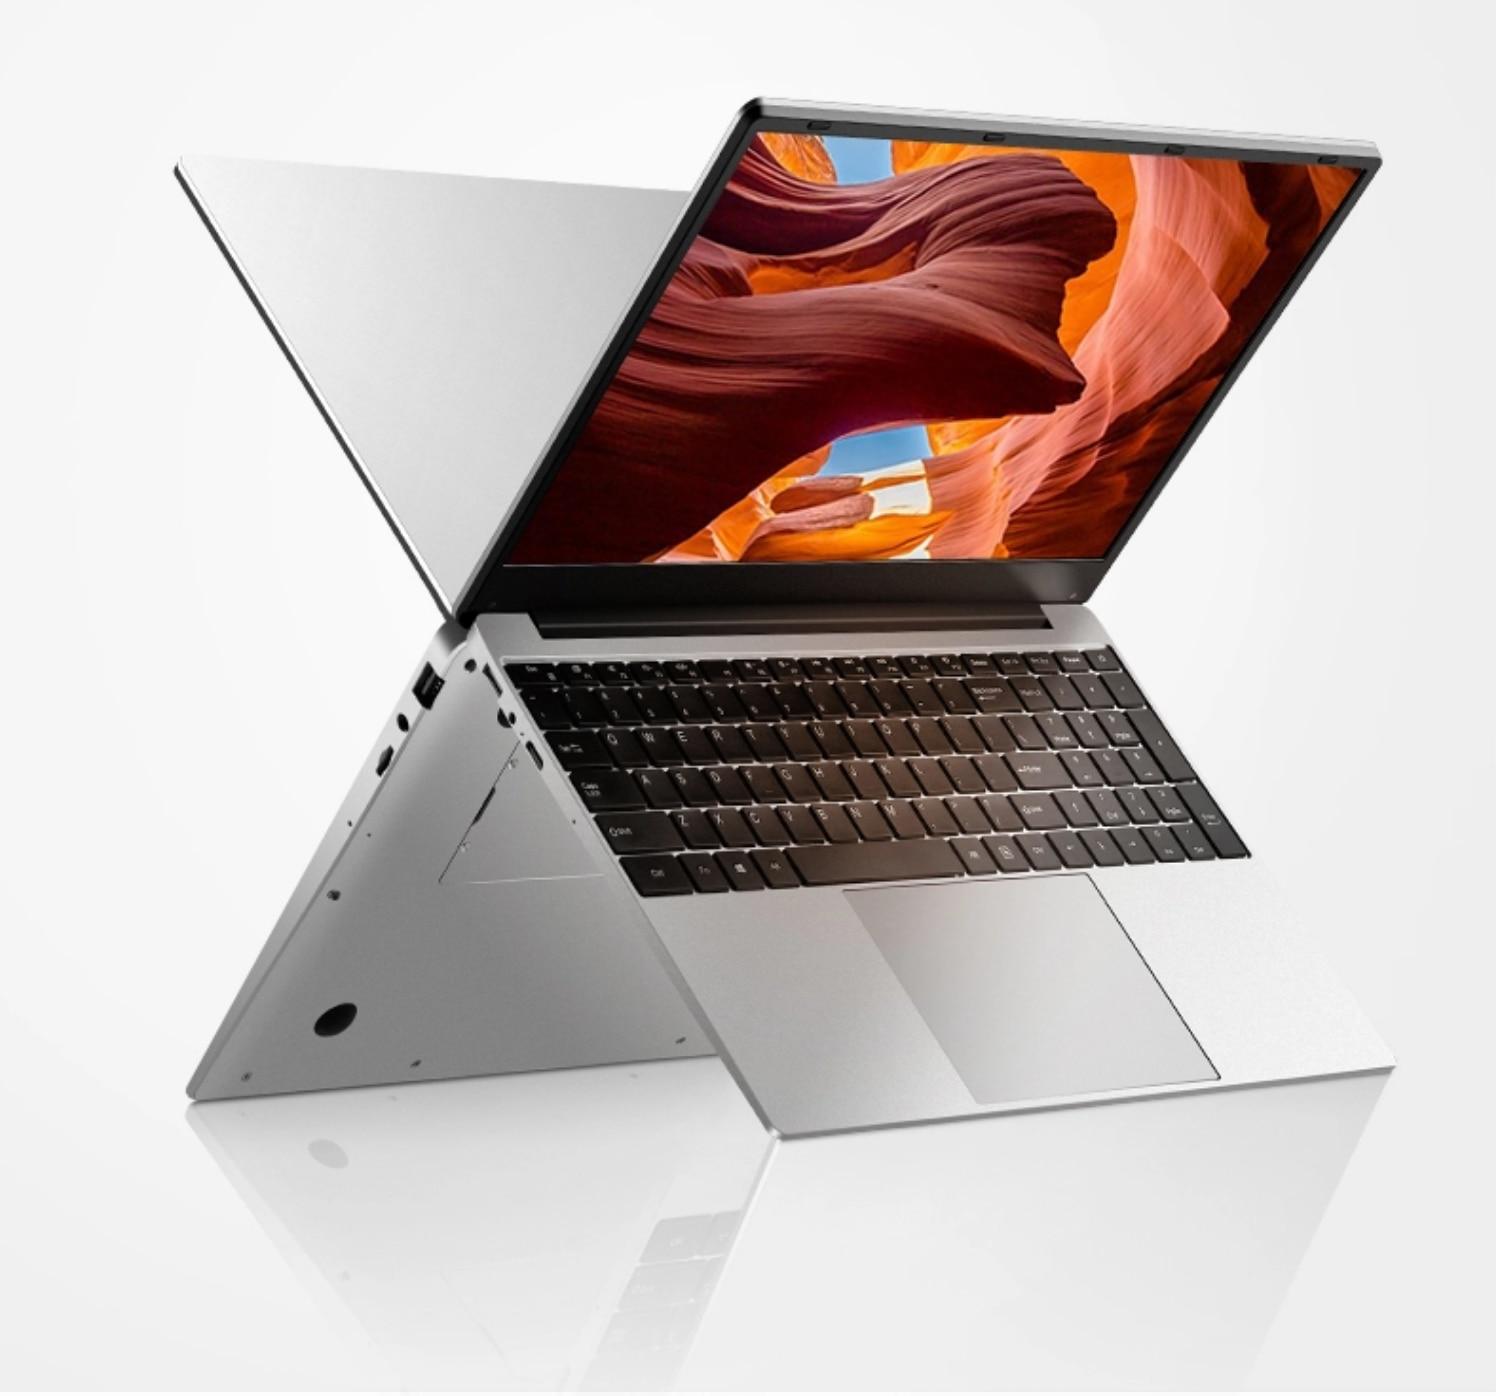 13 3 inch ultra thin laptop 1080P intel Core i5 6200U 8G DDR4 2133MHz 256G SATA SSD